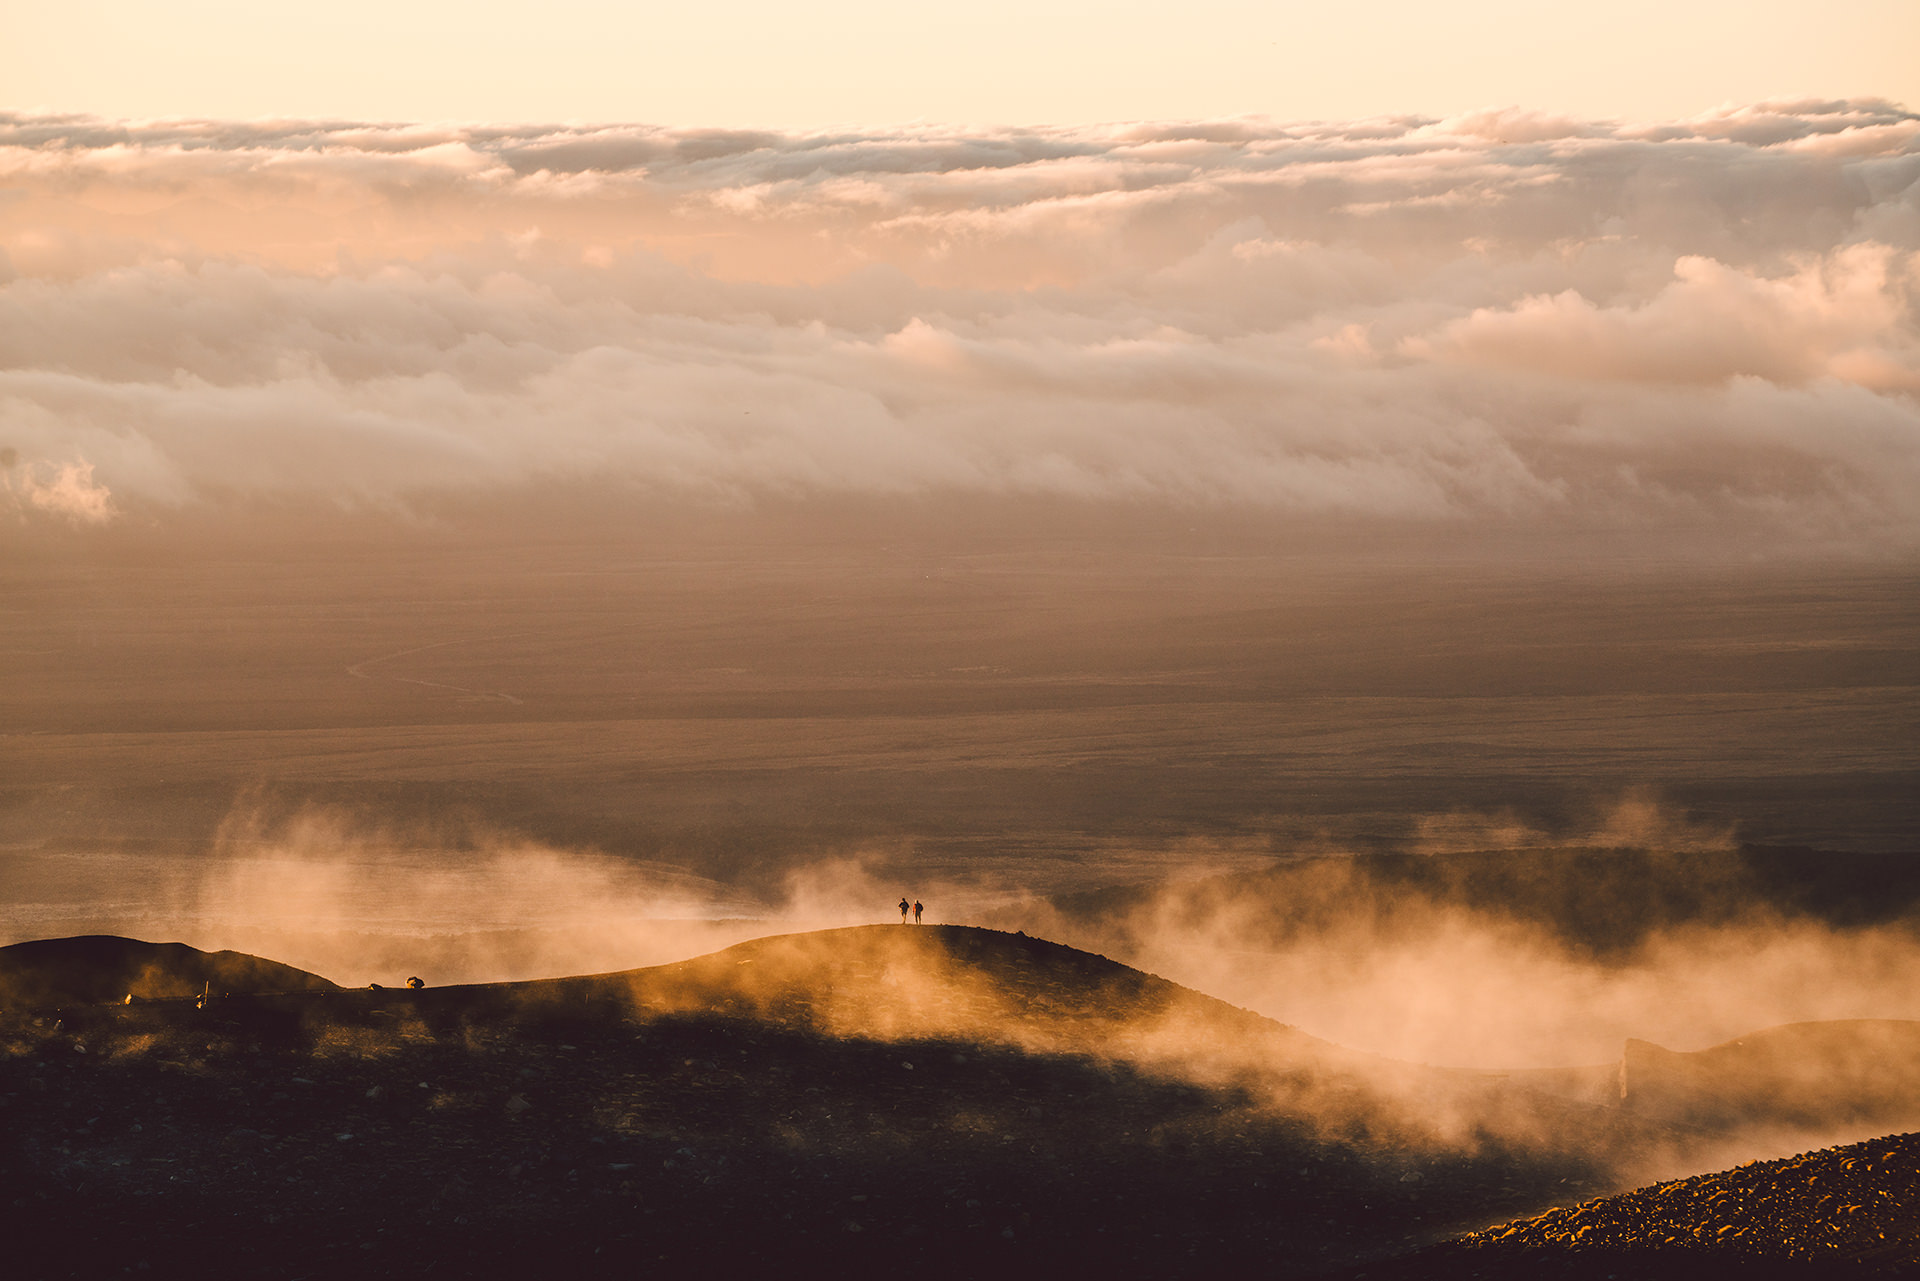 berg-wandern-neuseeland-sonnenuntergang-stimmung